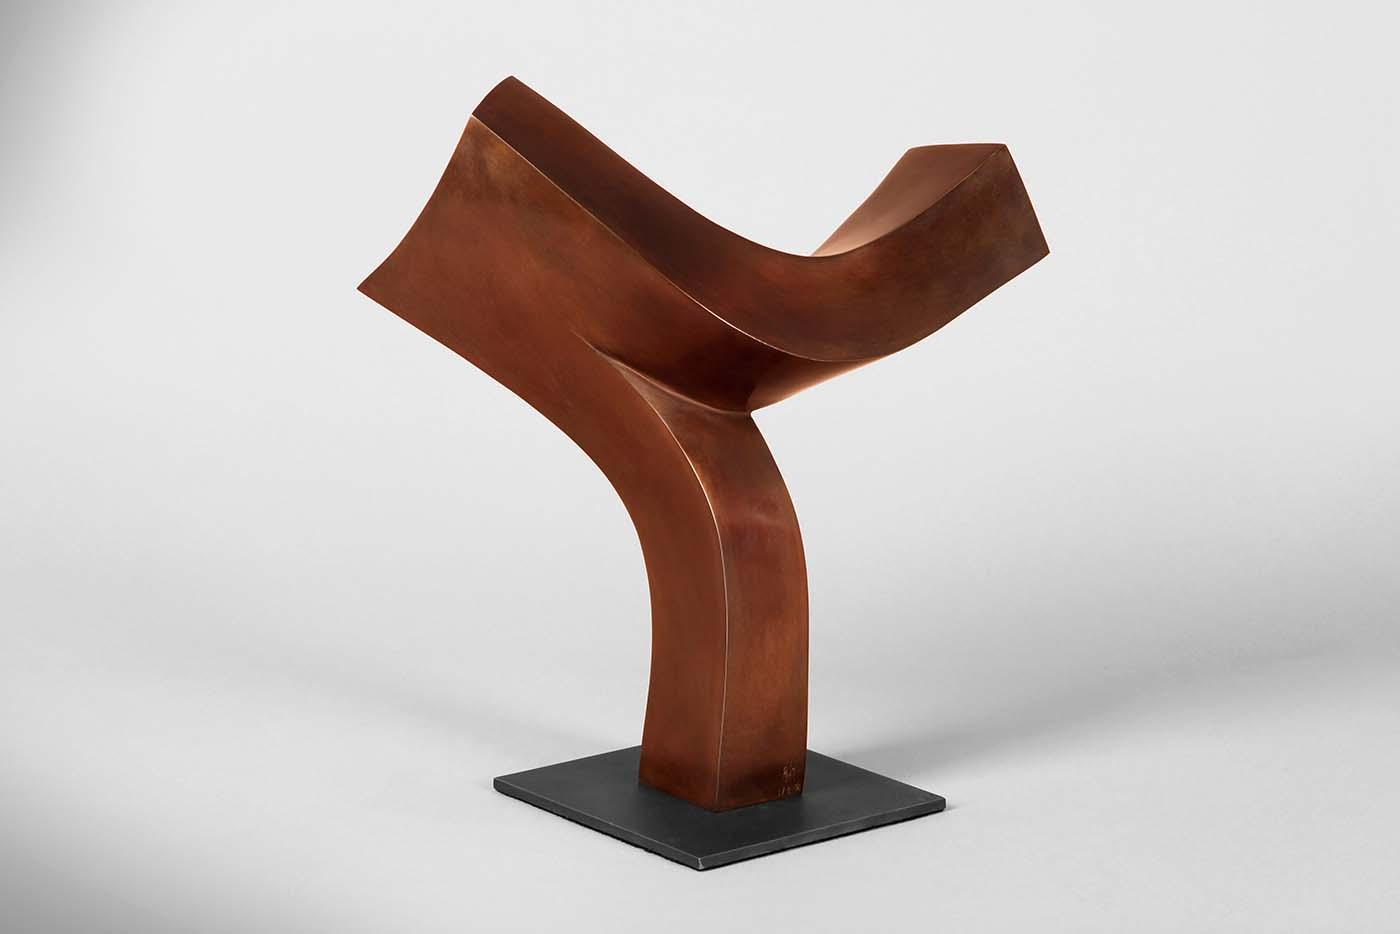 Balance (I), 2015, 35 x 31 x 16 cm